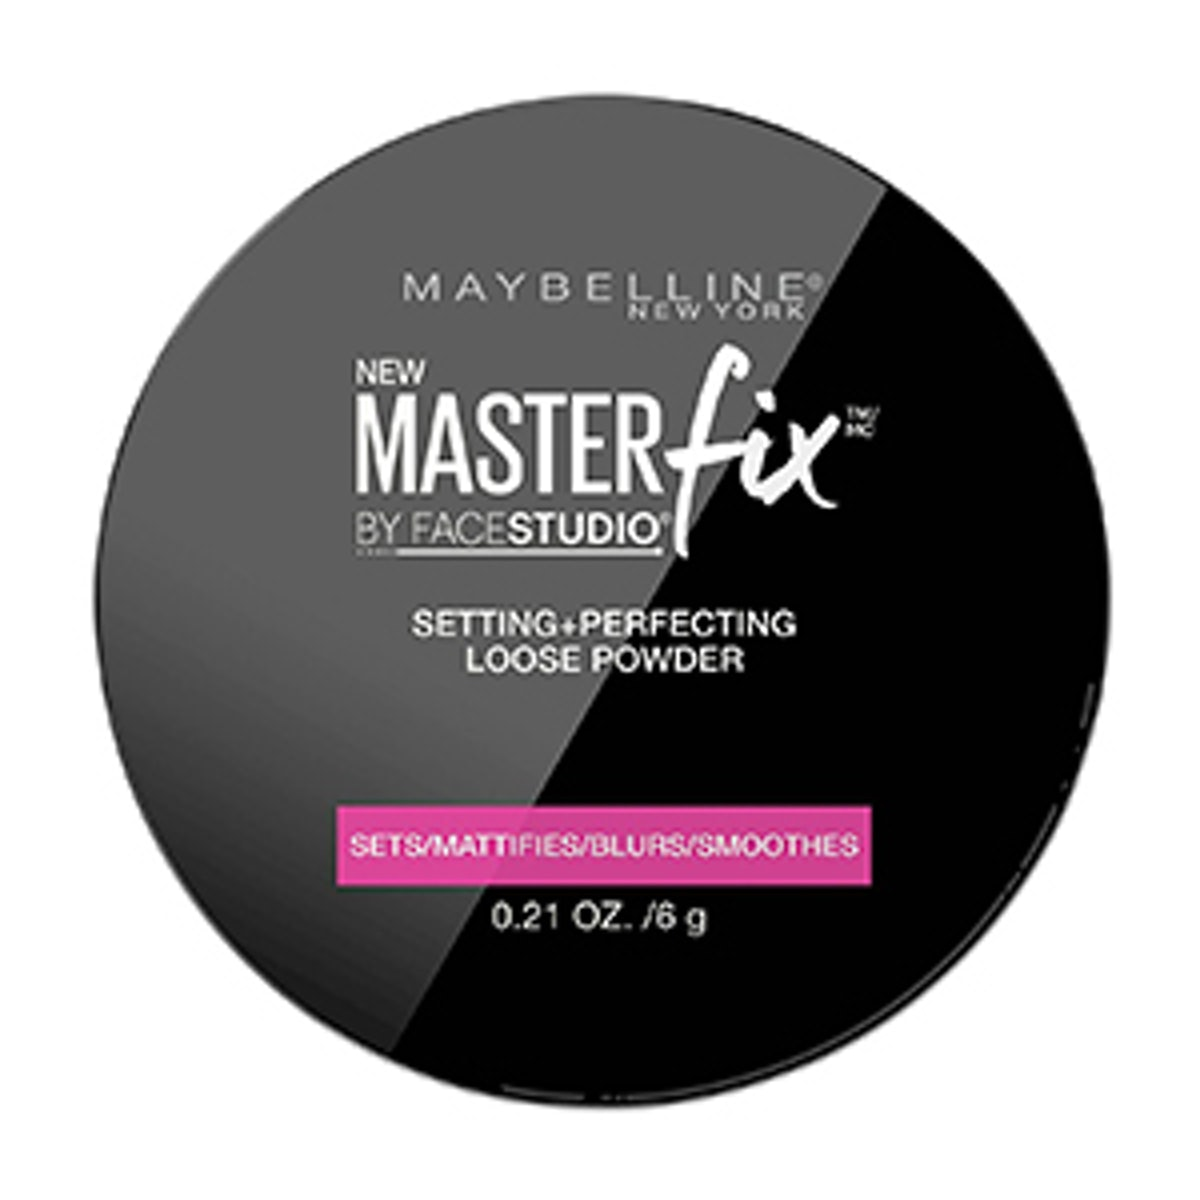 Maybelline Facestudio Master Fix Setting + Perfecting Loose Powder